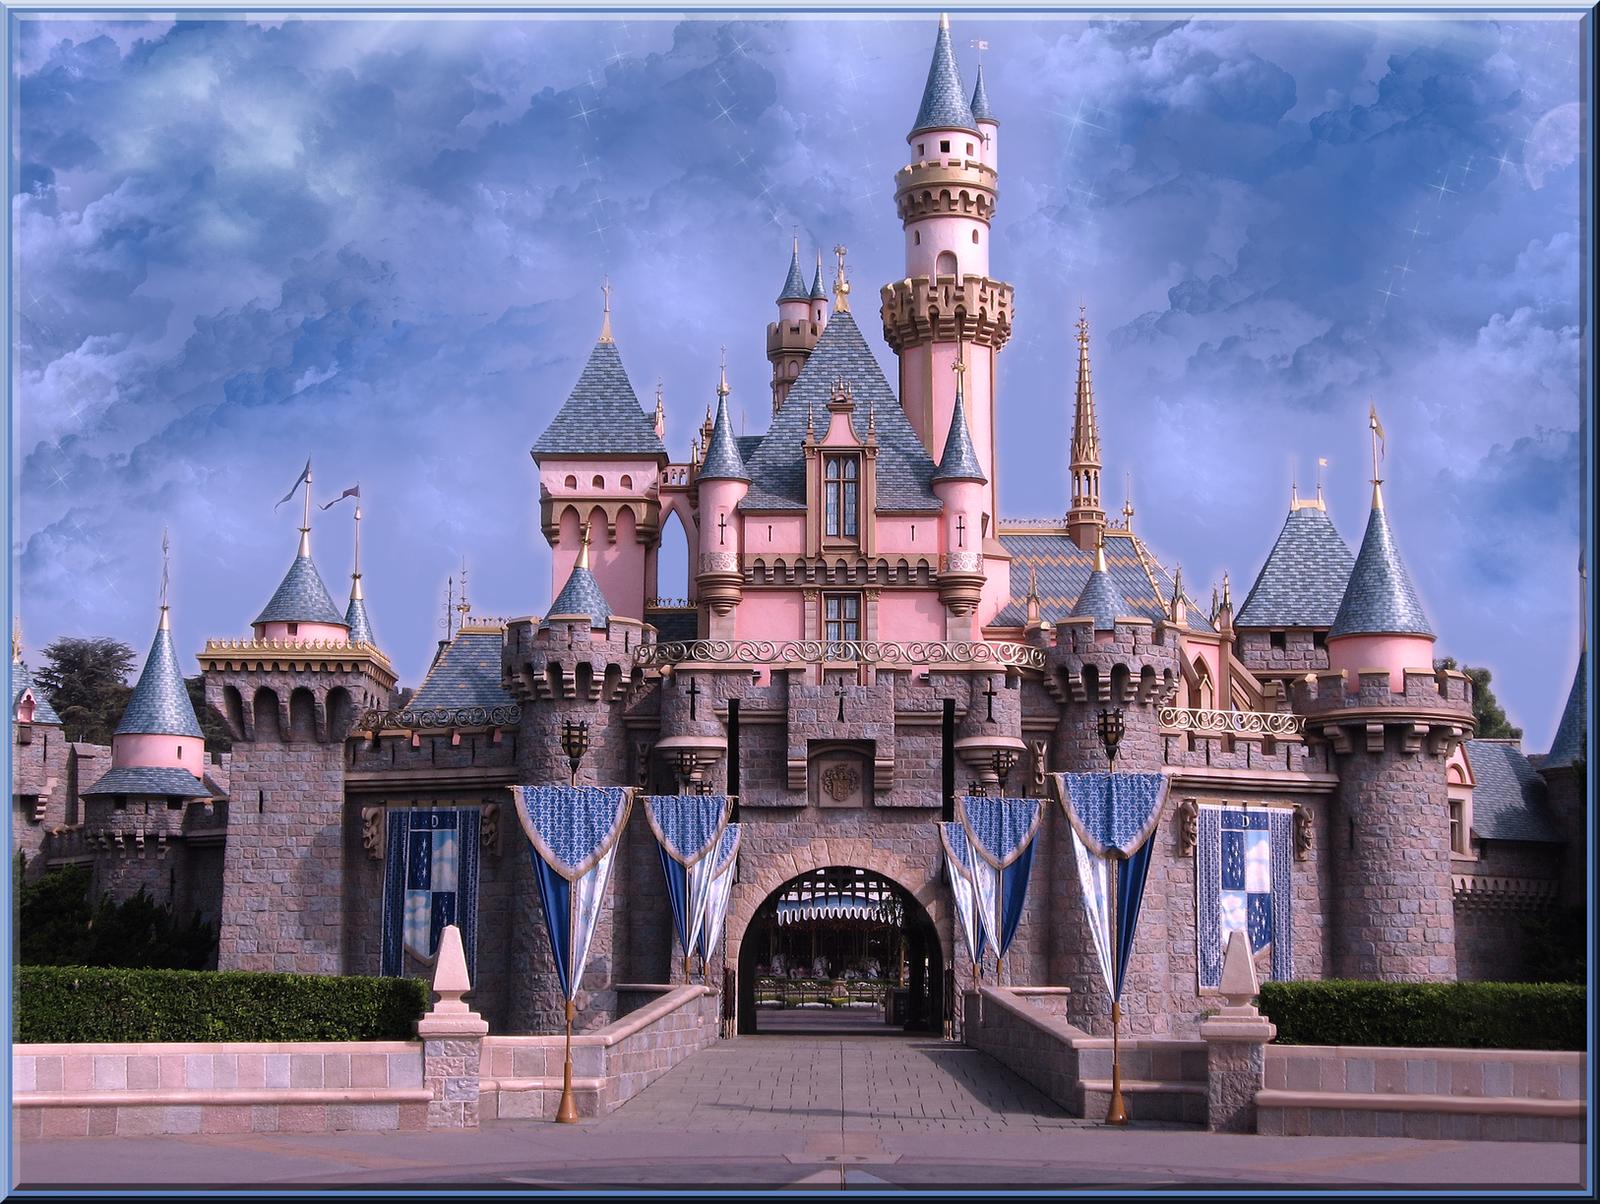 Sleeping Beauty Castle Disneyland by WDWParksGal